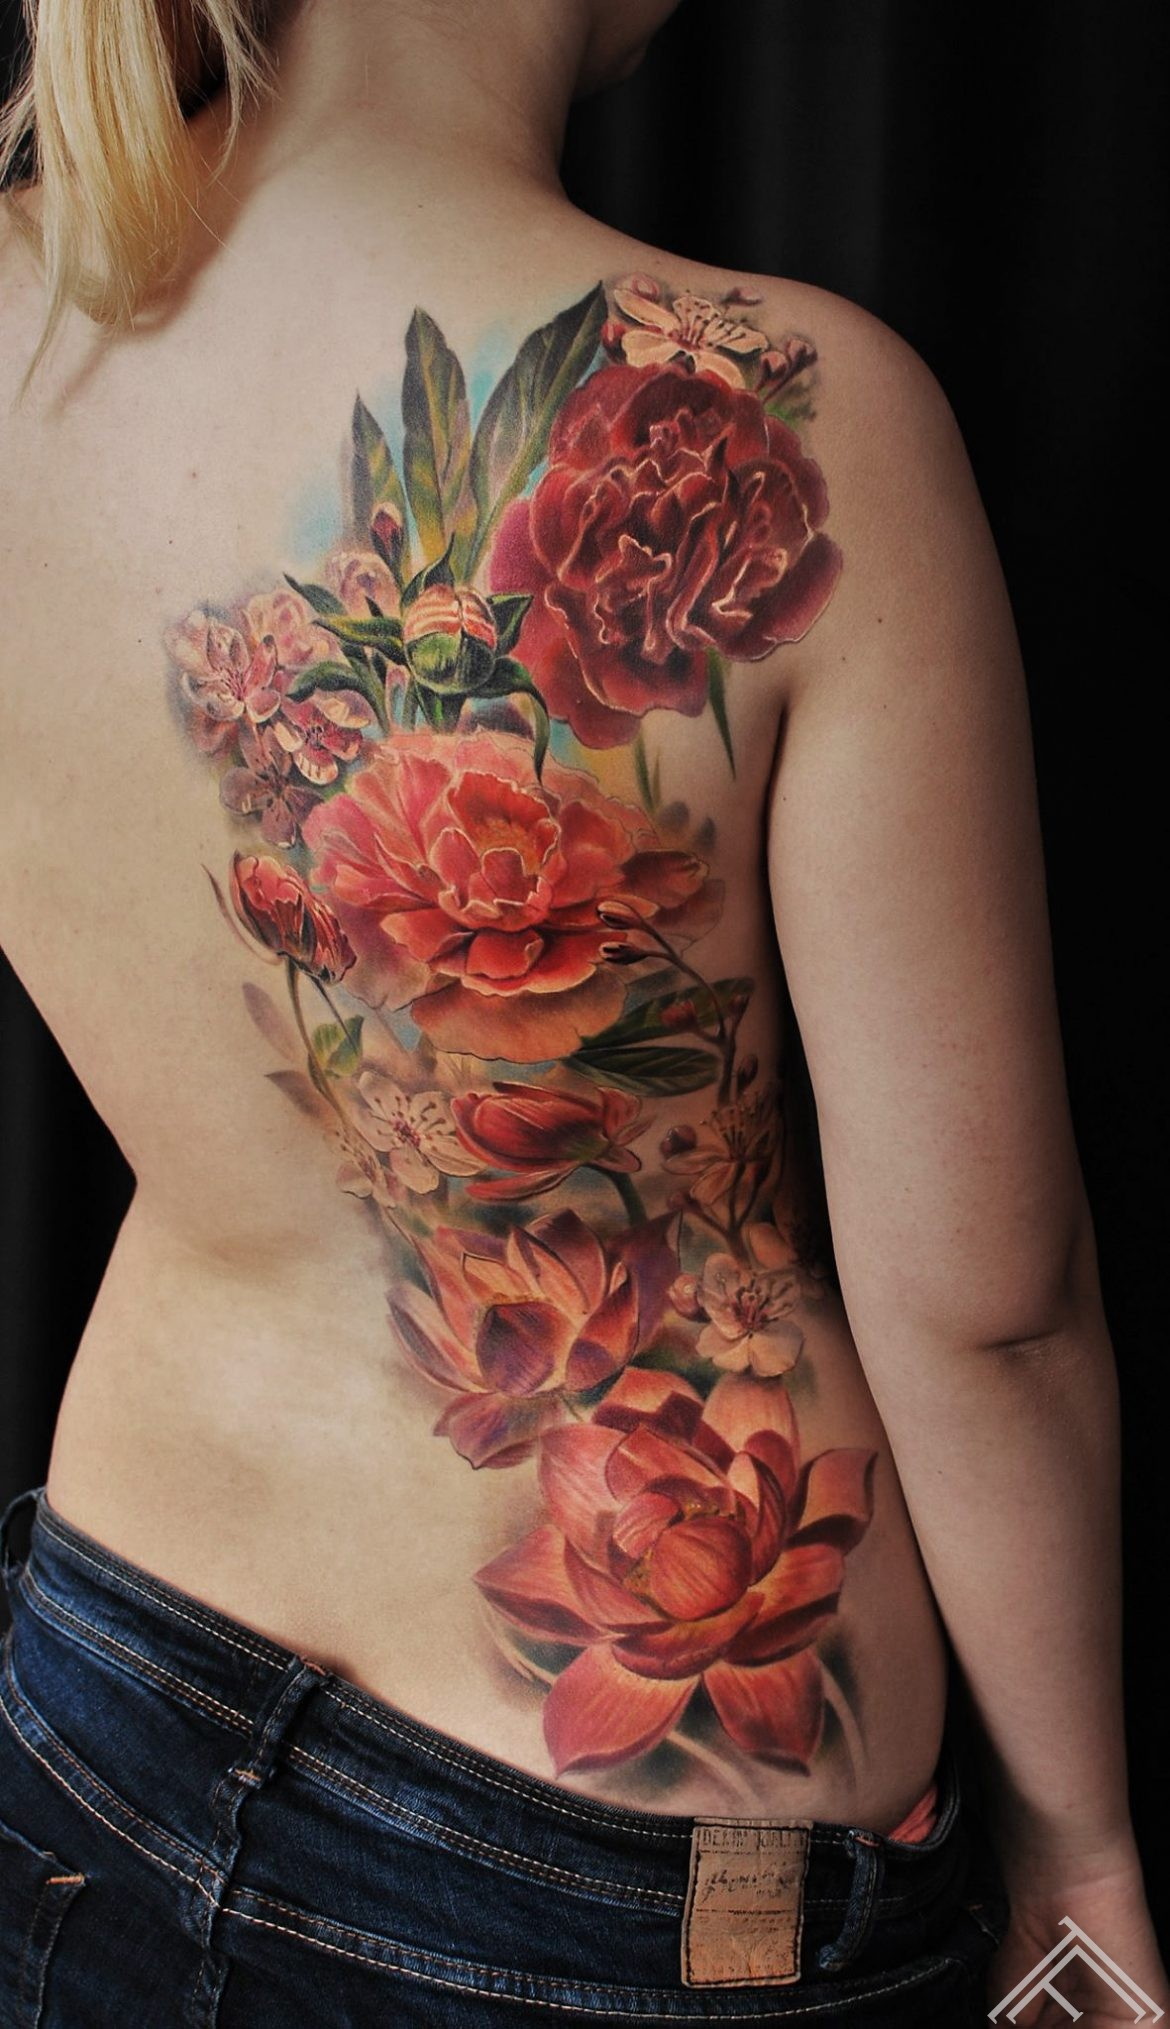 flowers-peony-lotus-lotos-cherryblosom-tattoo-ziedi-tattoofrequency-riga-marispavlo